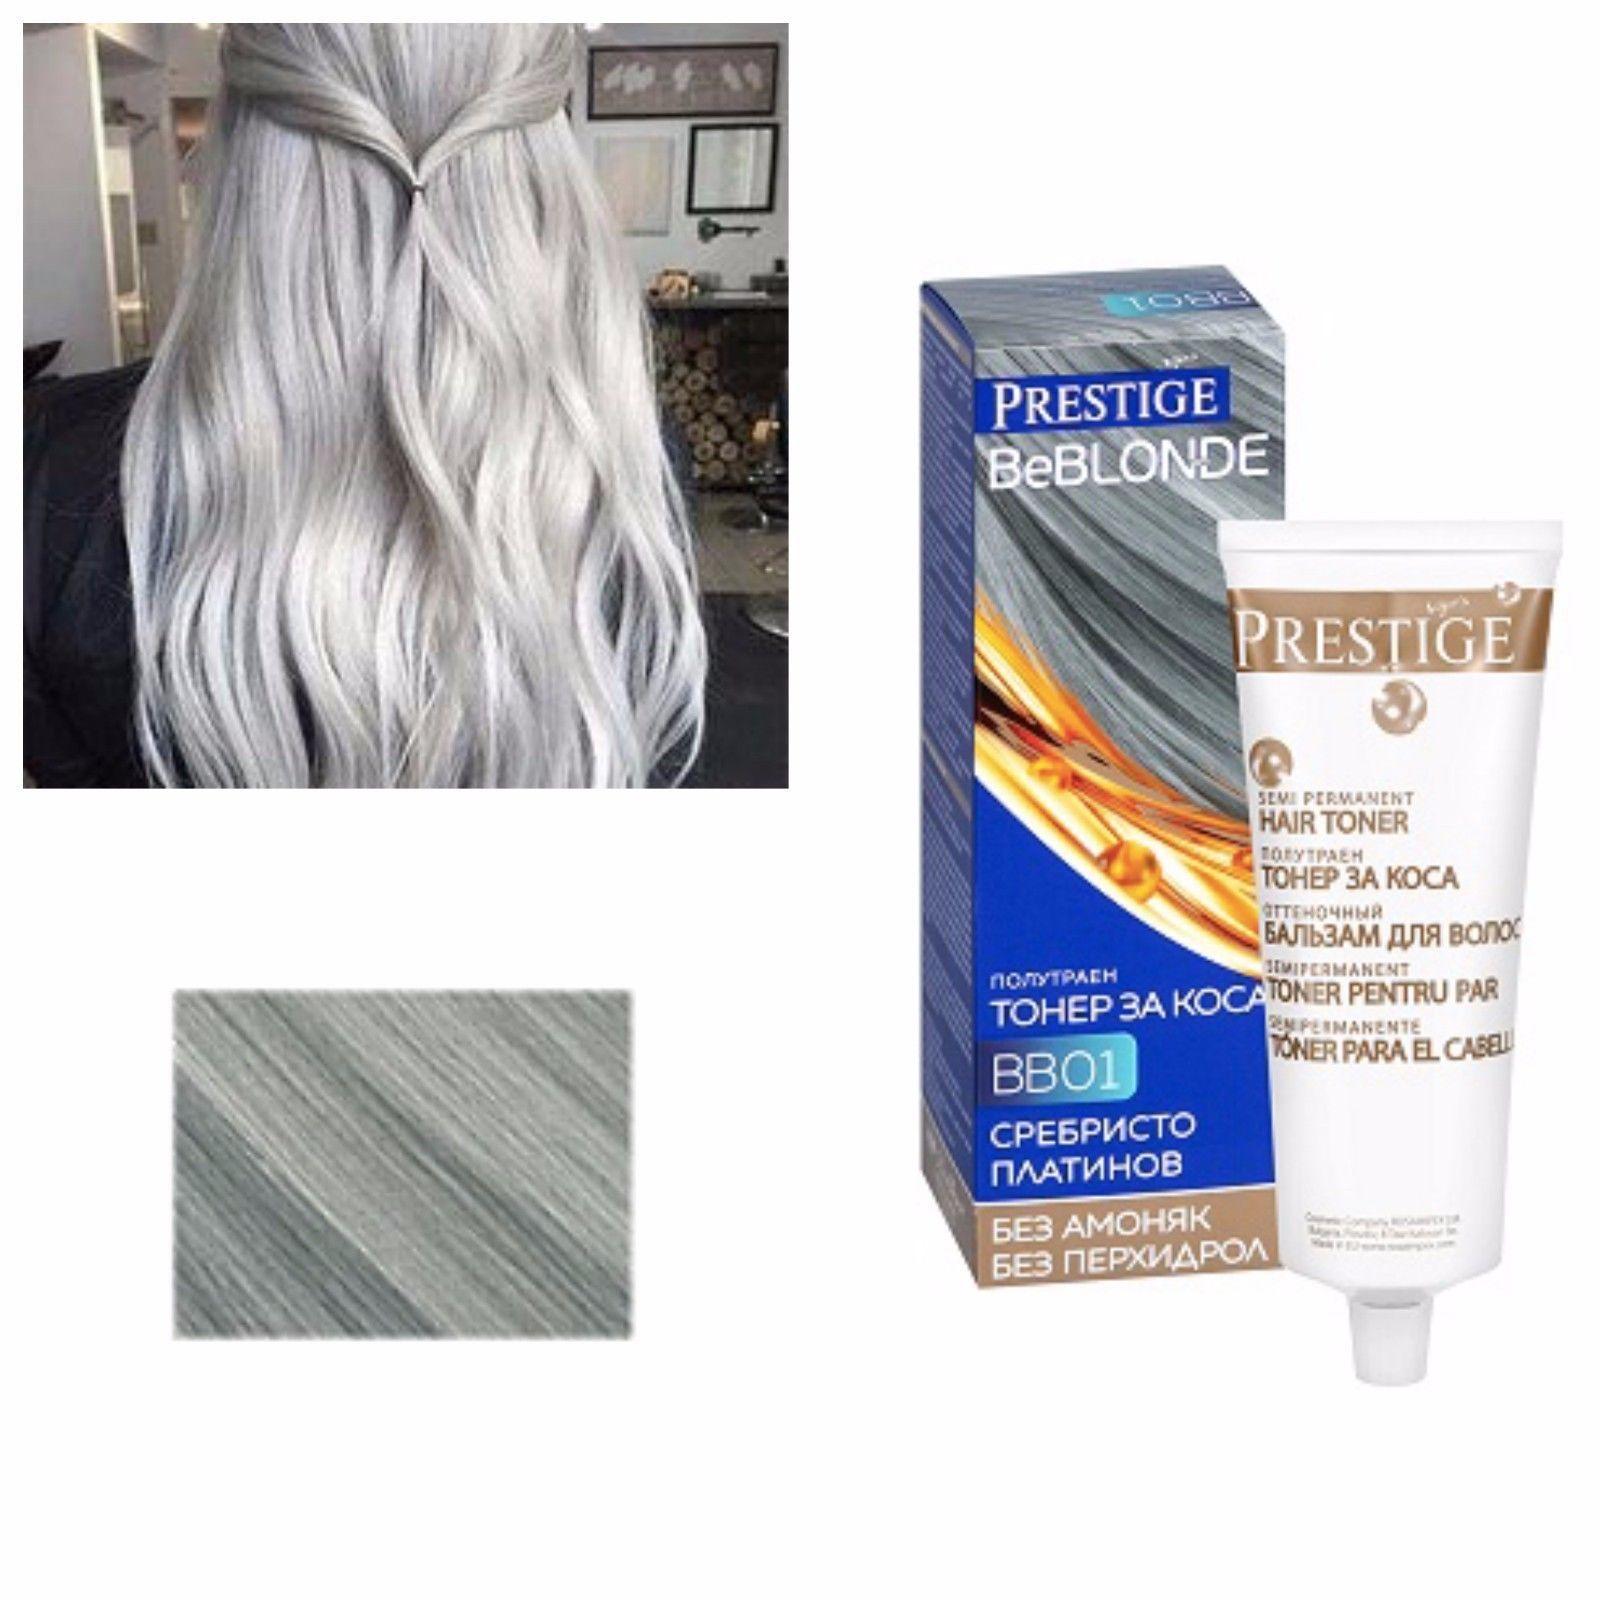 Grey Hair Silver Effect Toner Dye Blond Hair 100 Ml No Ammonia